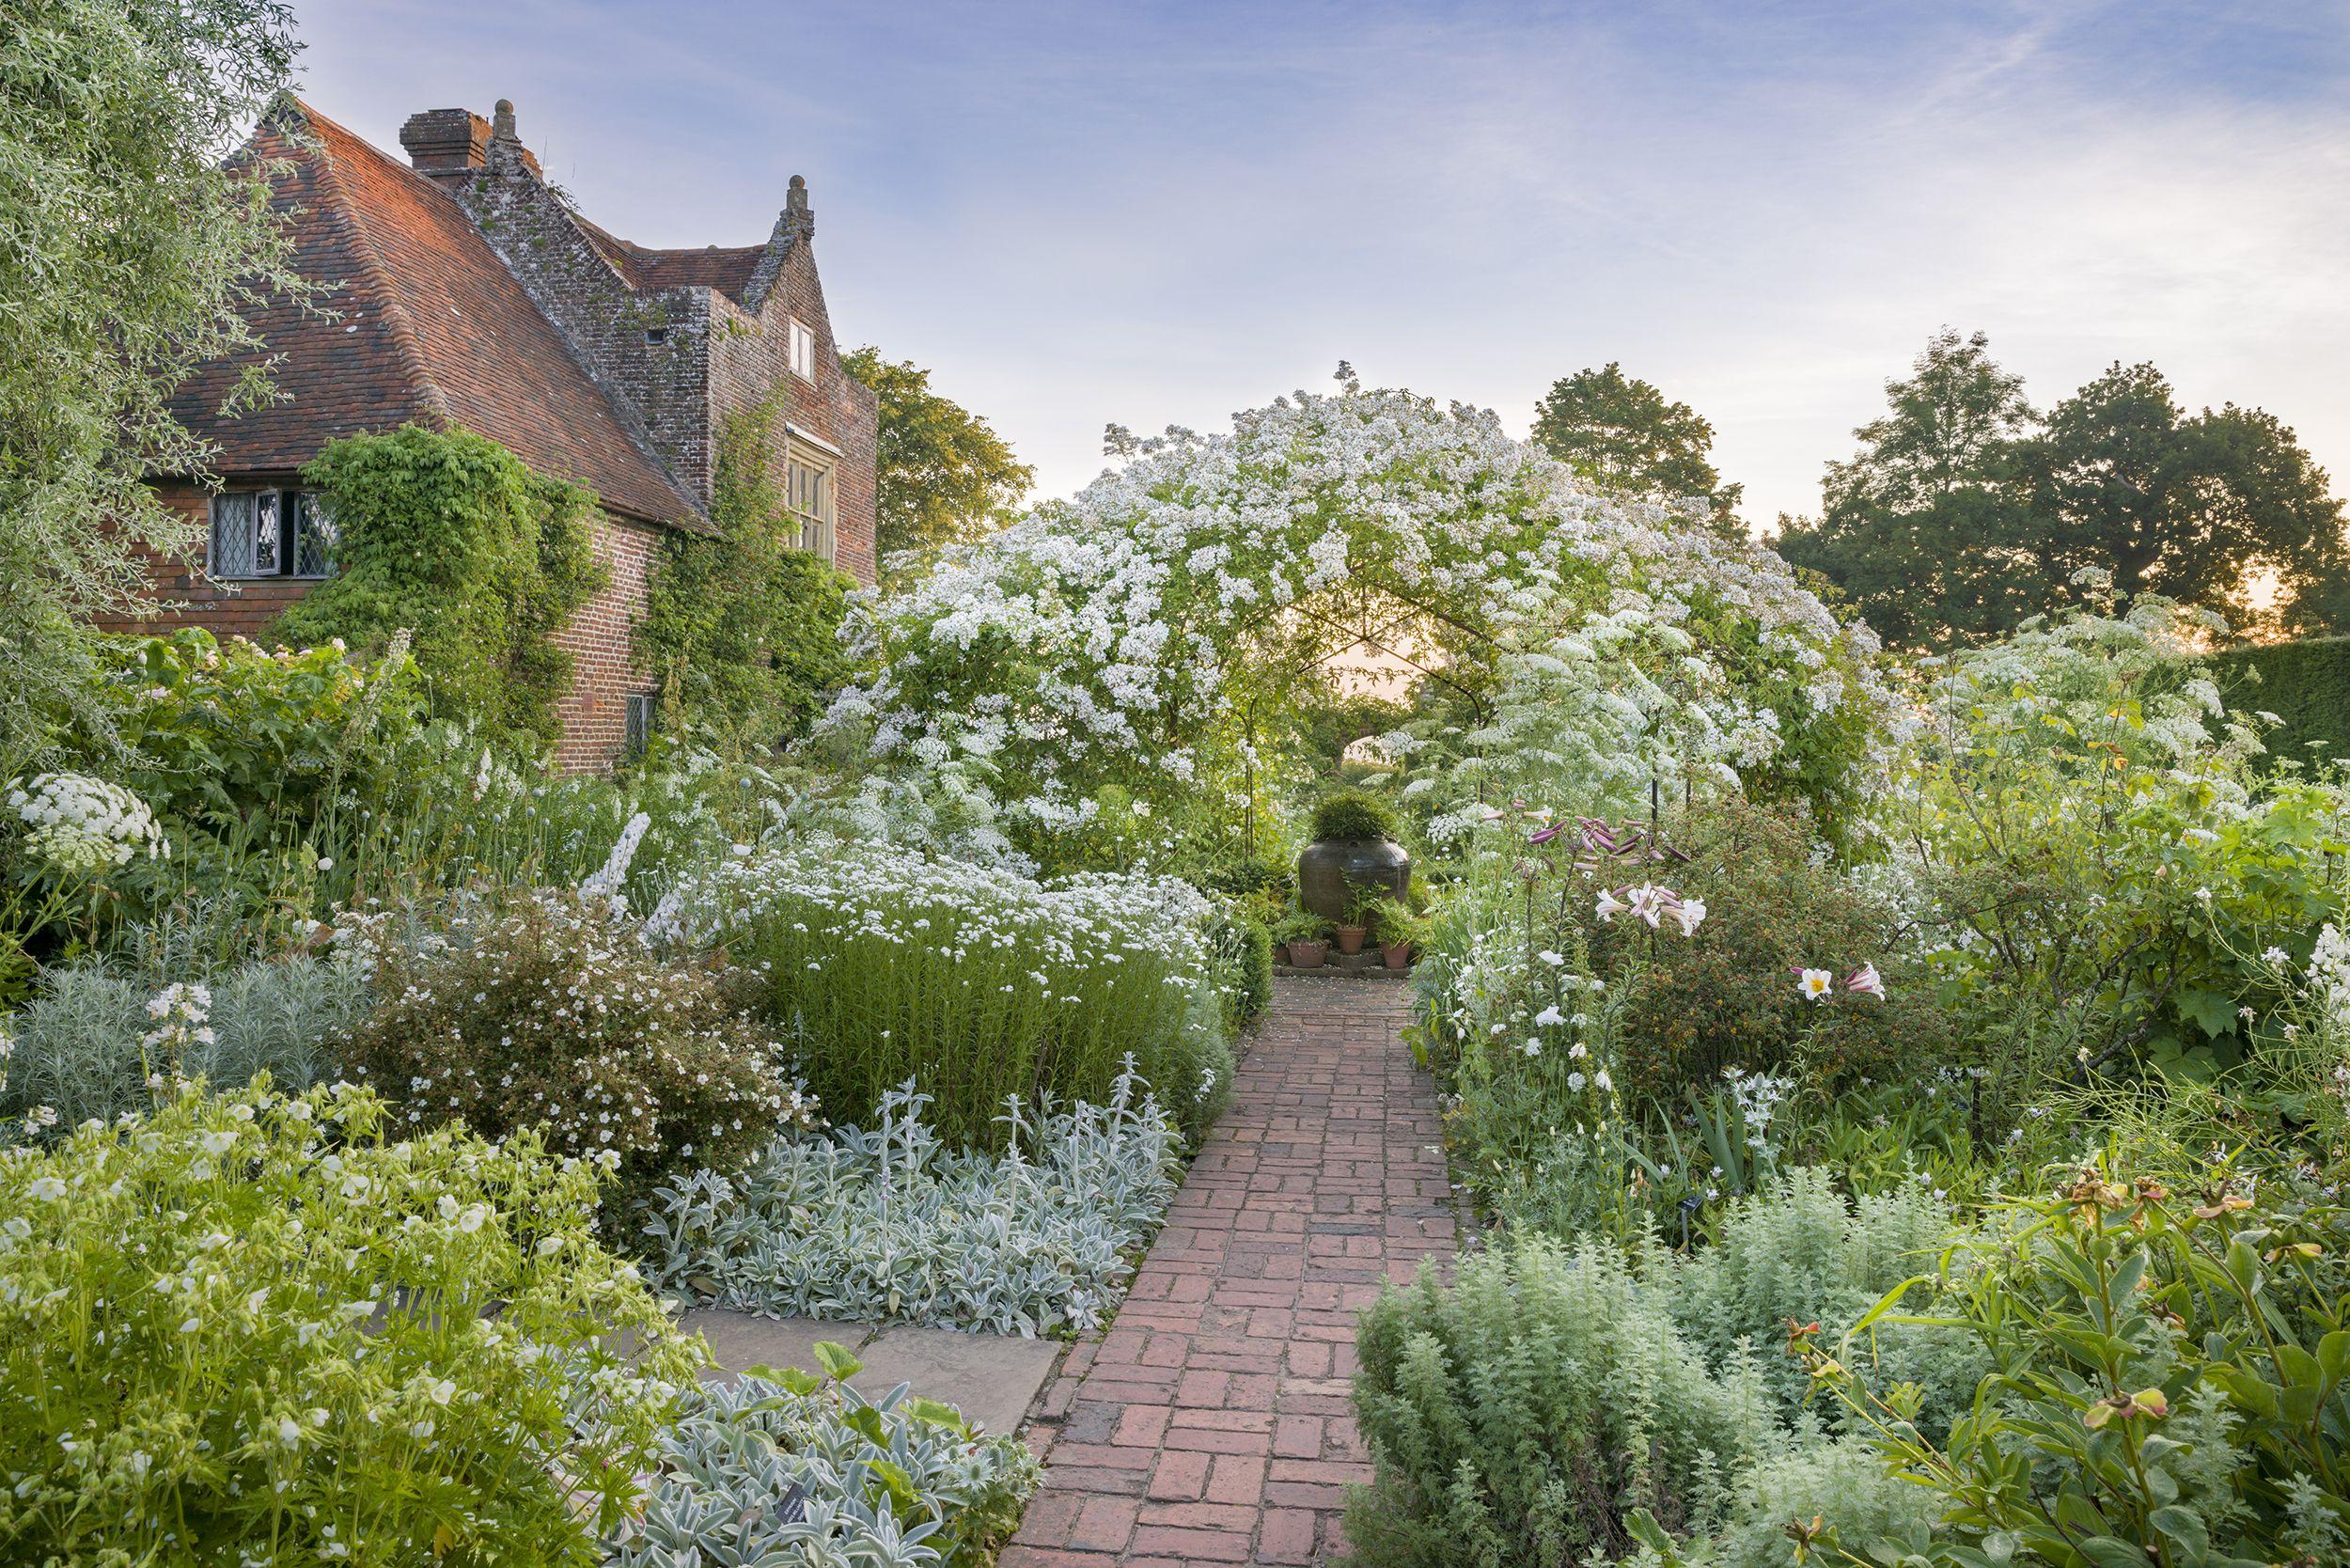 Is Sissinghurst Castle Garden the most beautiful garden in Britain?